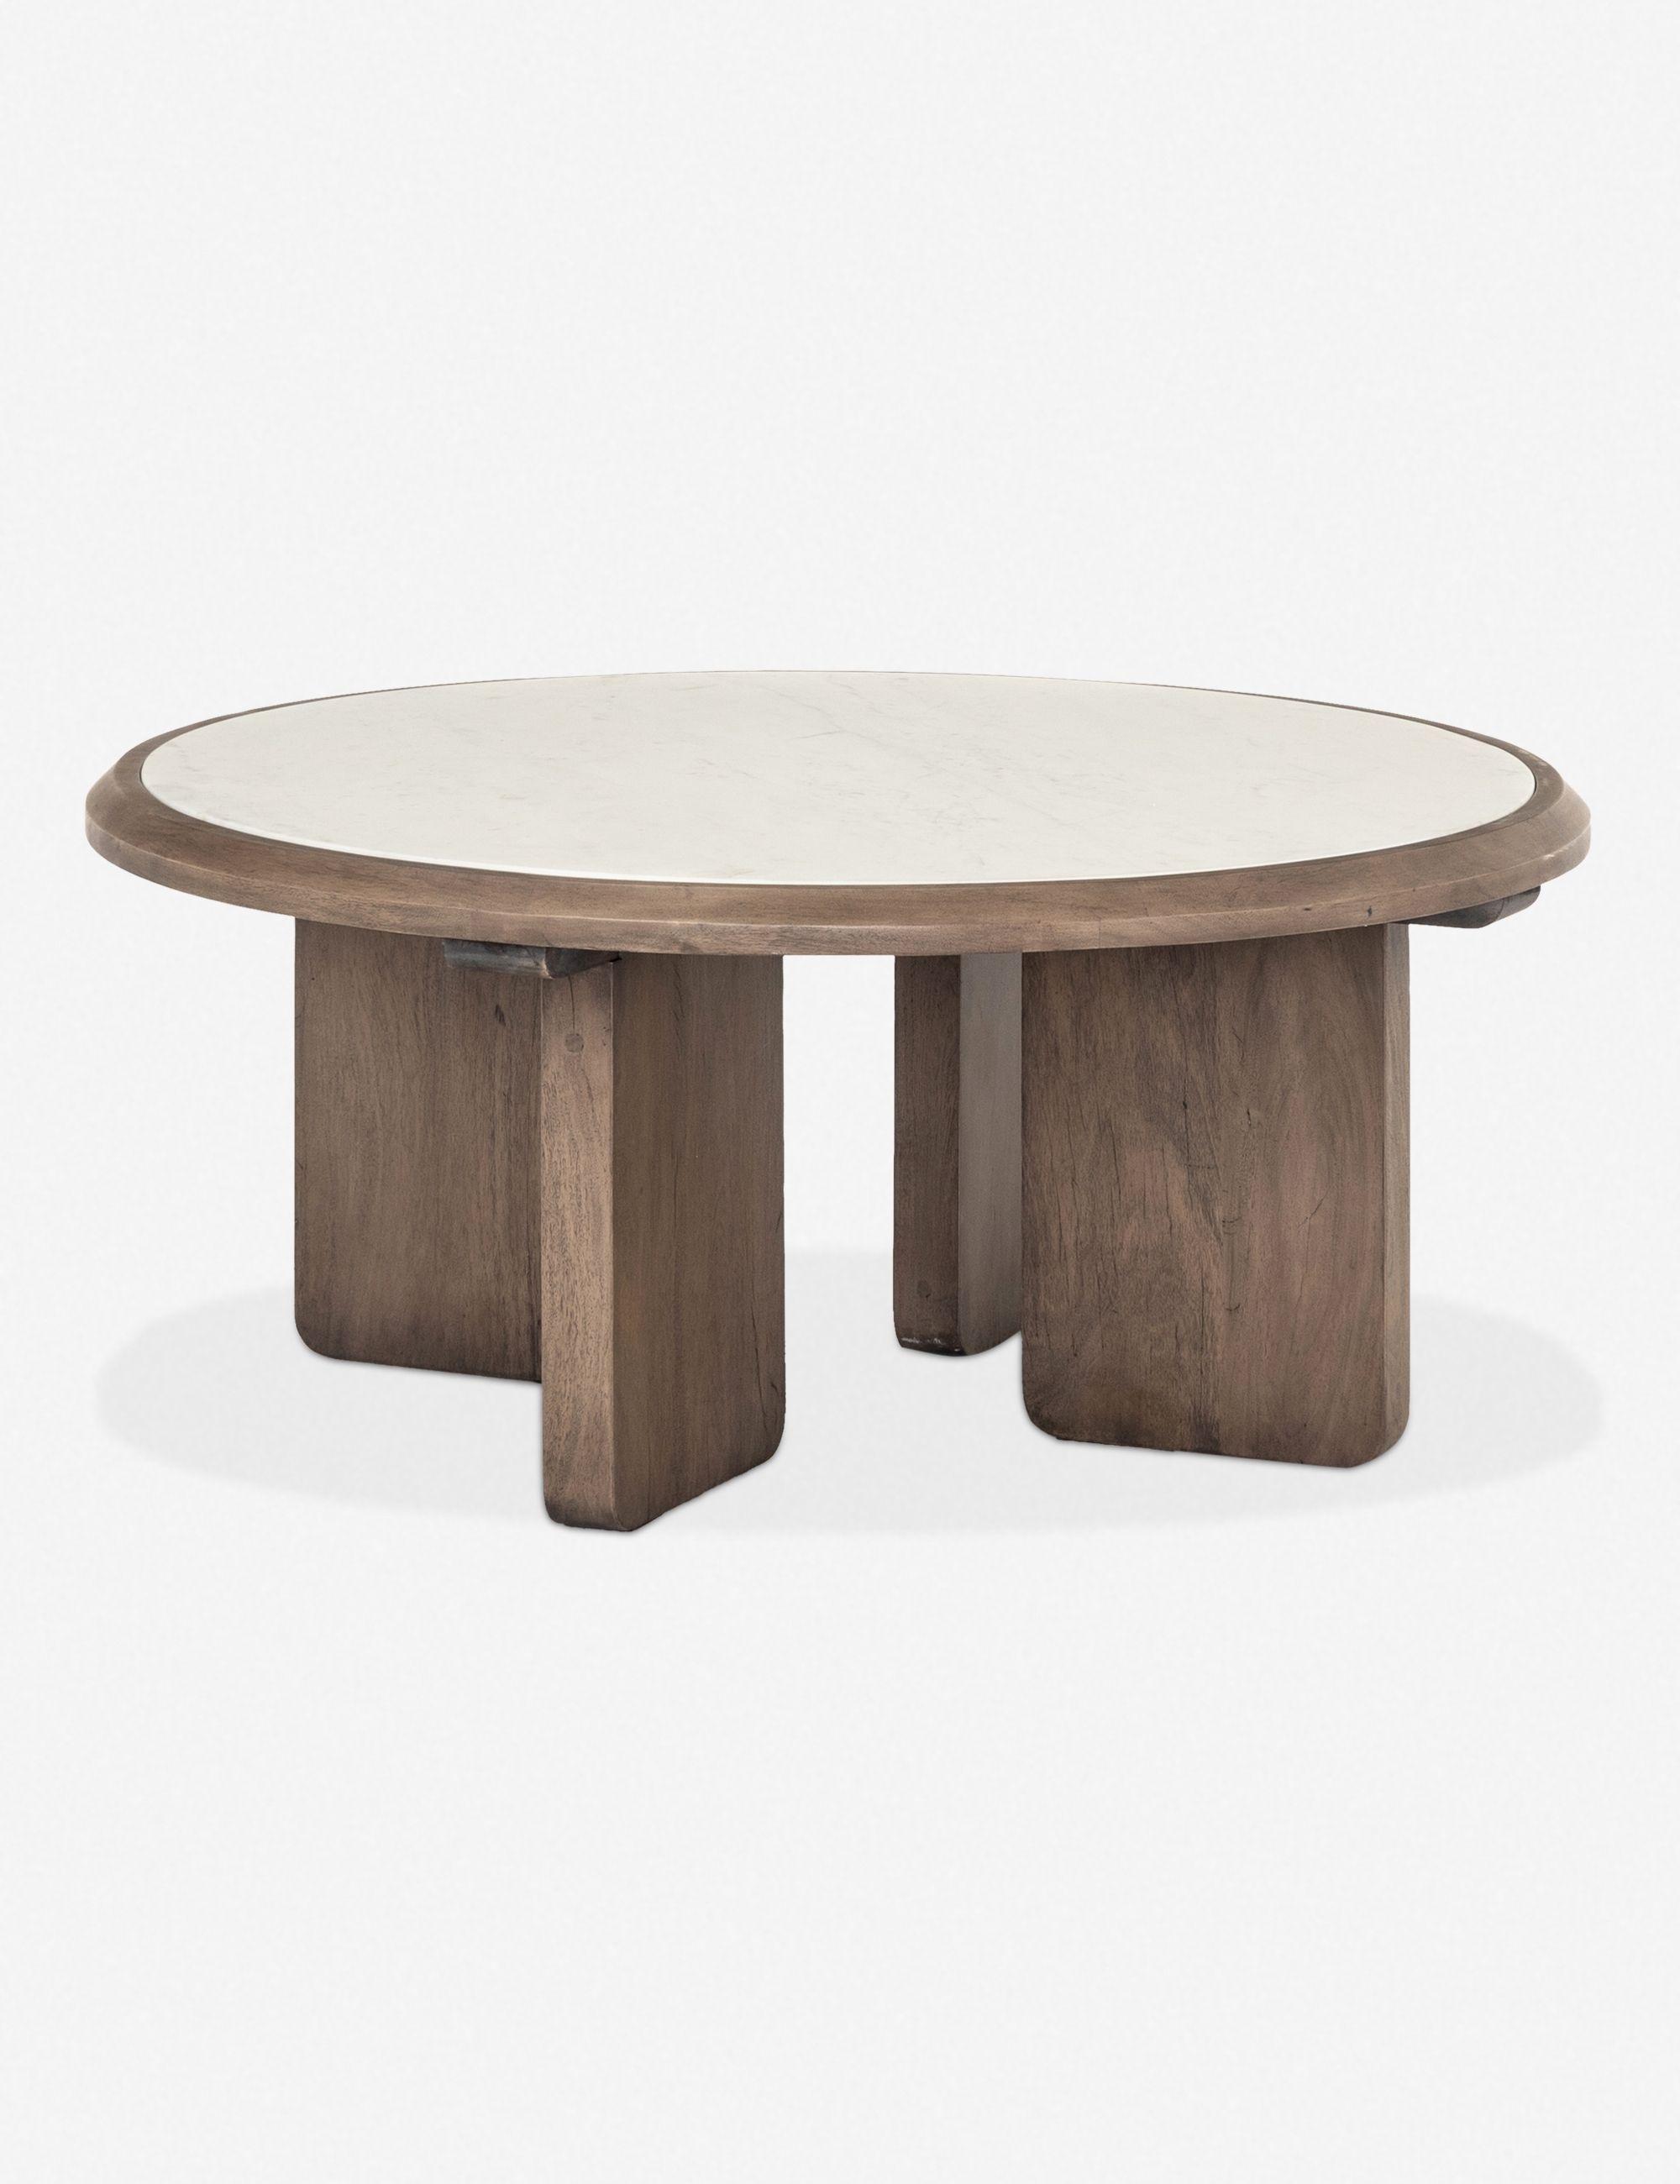 Lido Round Coffee Table Coffee Table Coffee Table Wood Round Wood Coffee Table [ 2600 x 2000 Pixel ]